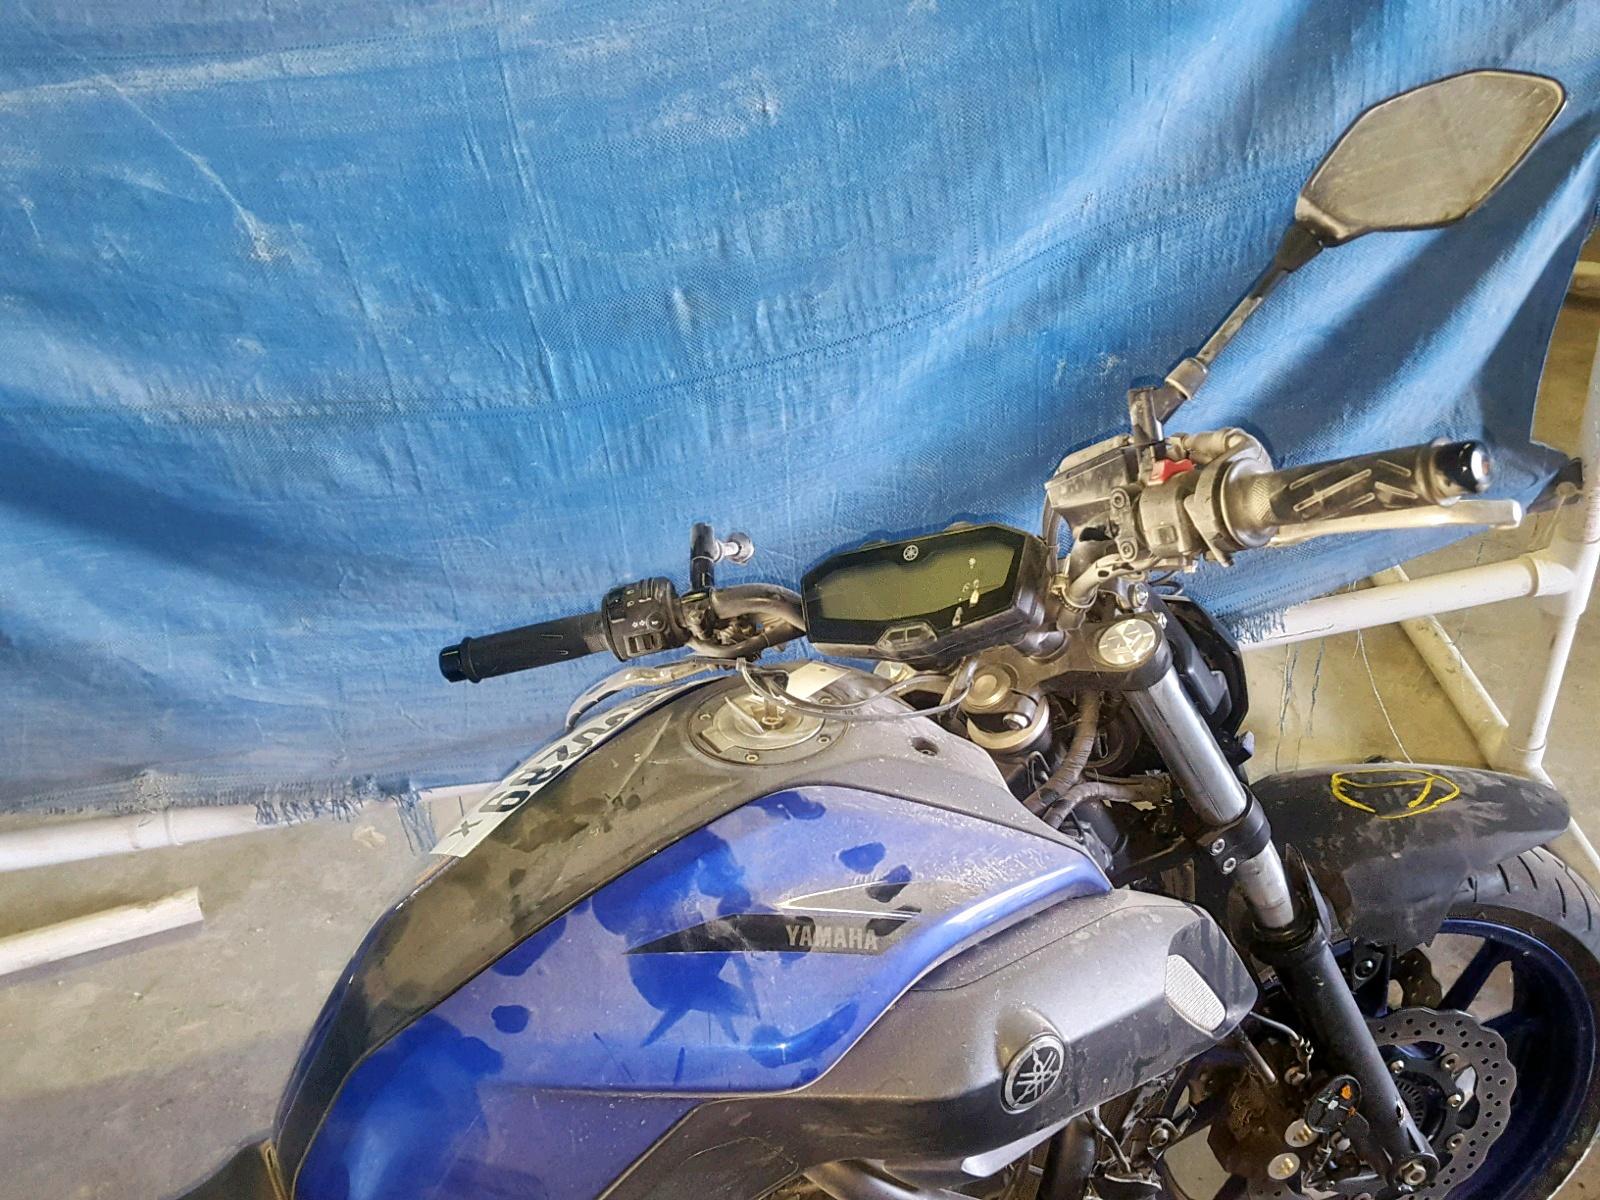 2018 Yamaha Mt07 2 in FL - Miami South (JYARM27E7JA000884) for Sale